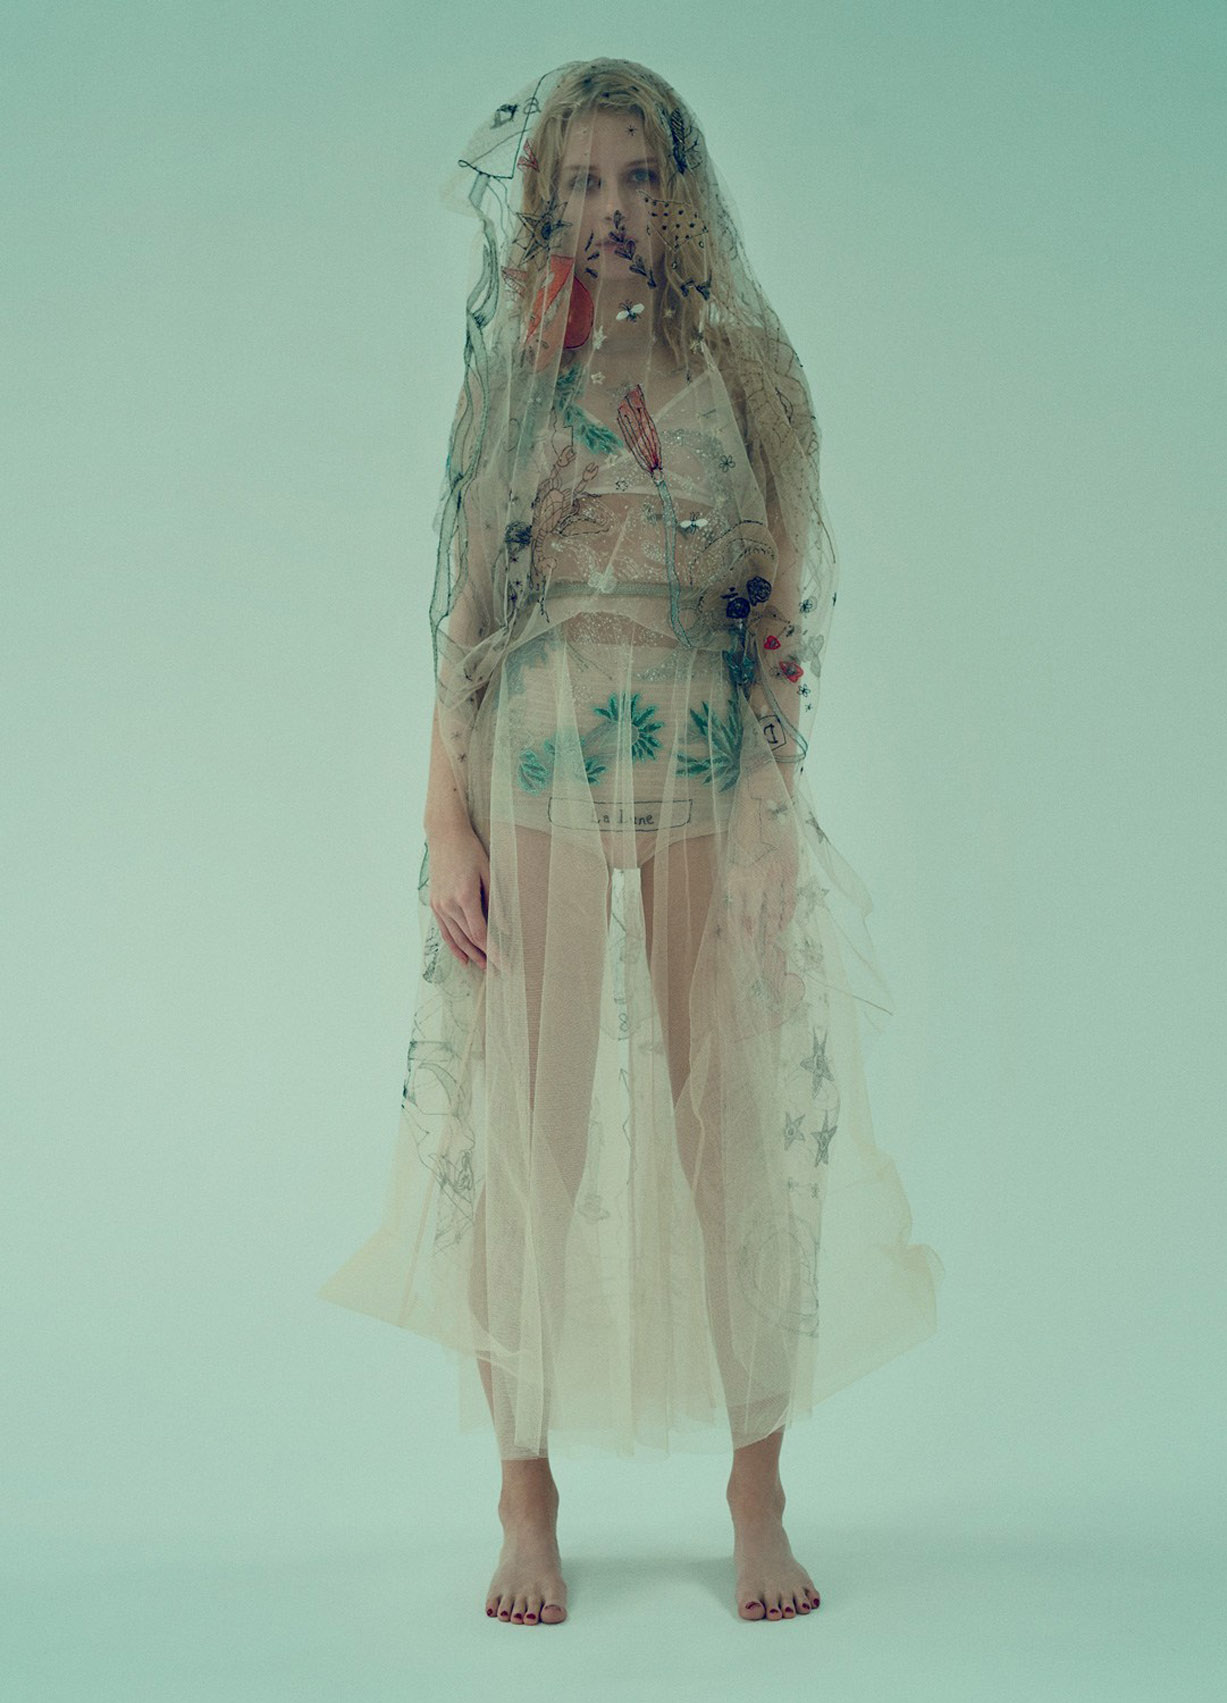 зеленая Лотти Мосс / Lottie Moss by Sofia Sanchez & Mauro Mongiello - Numero Magazine China april 2017